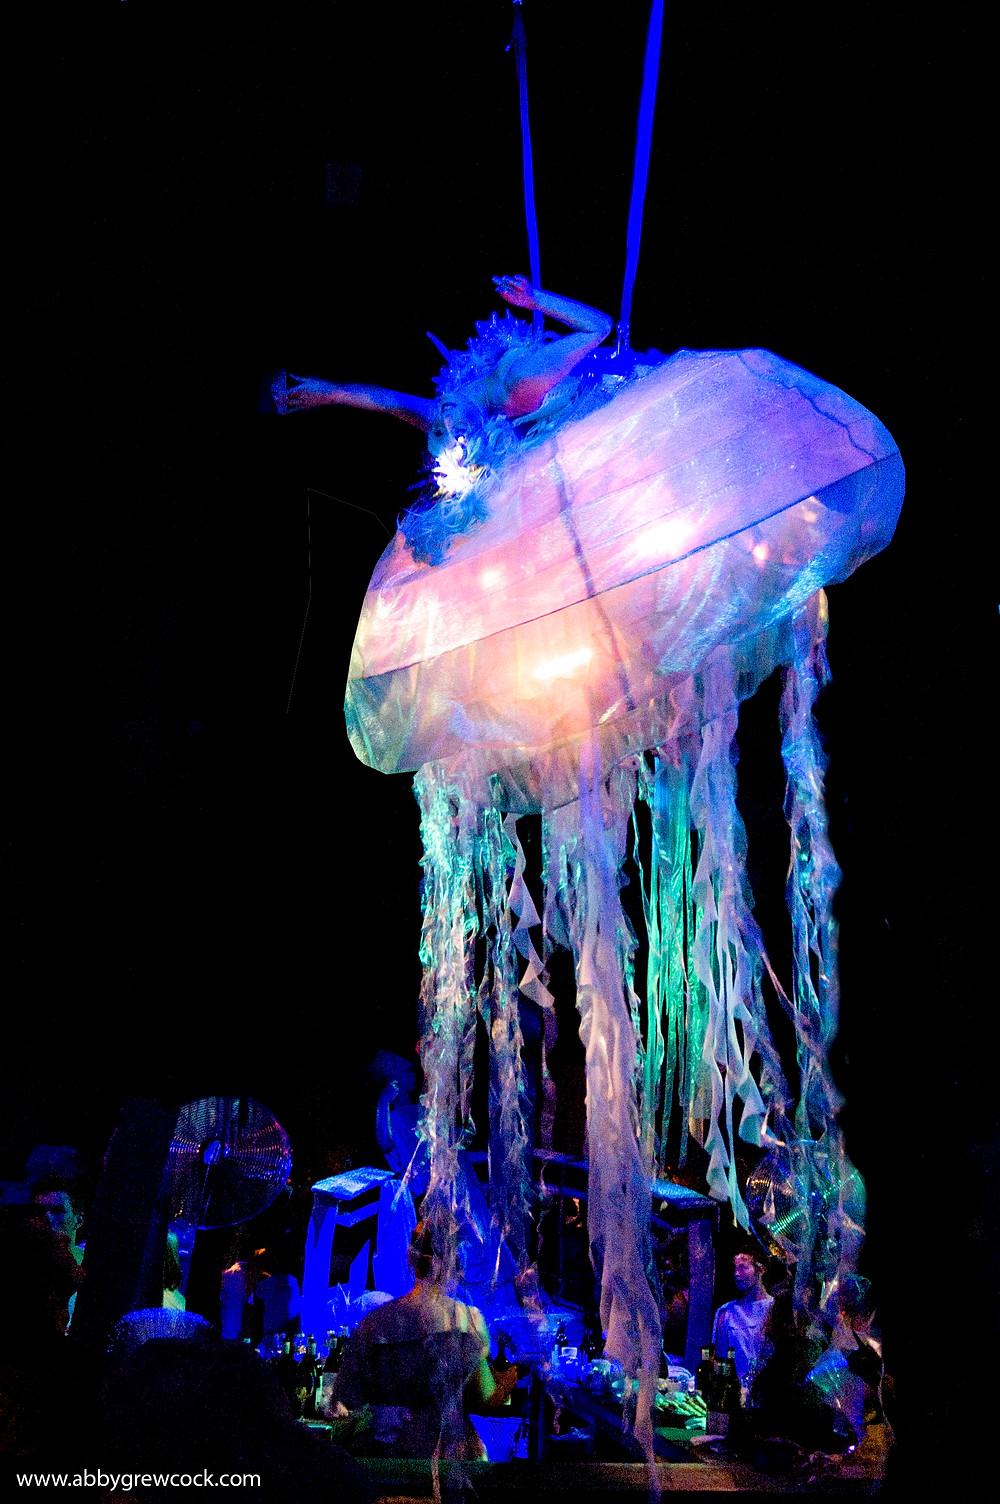 Desiree as a Viva aerial Jellyfish